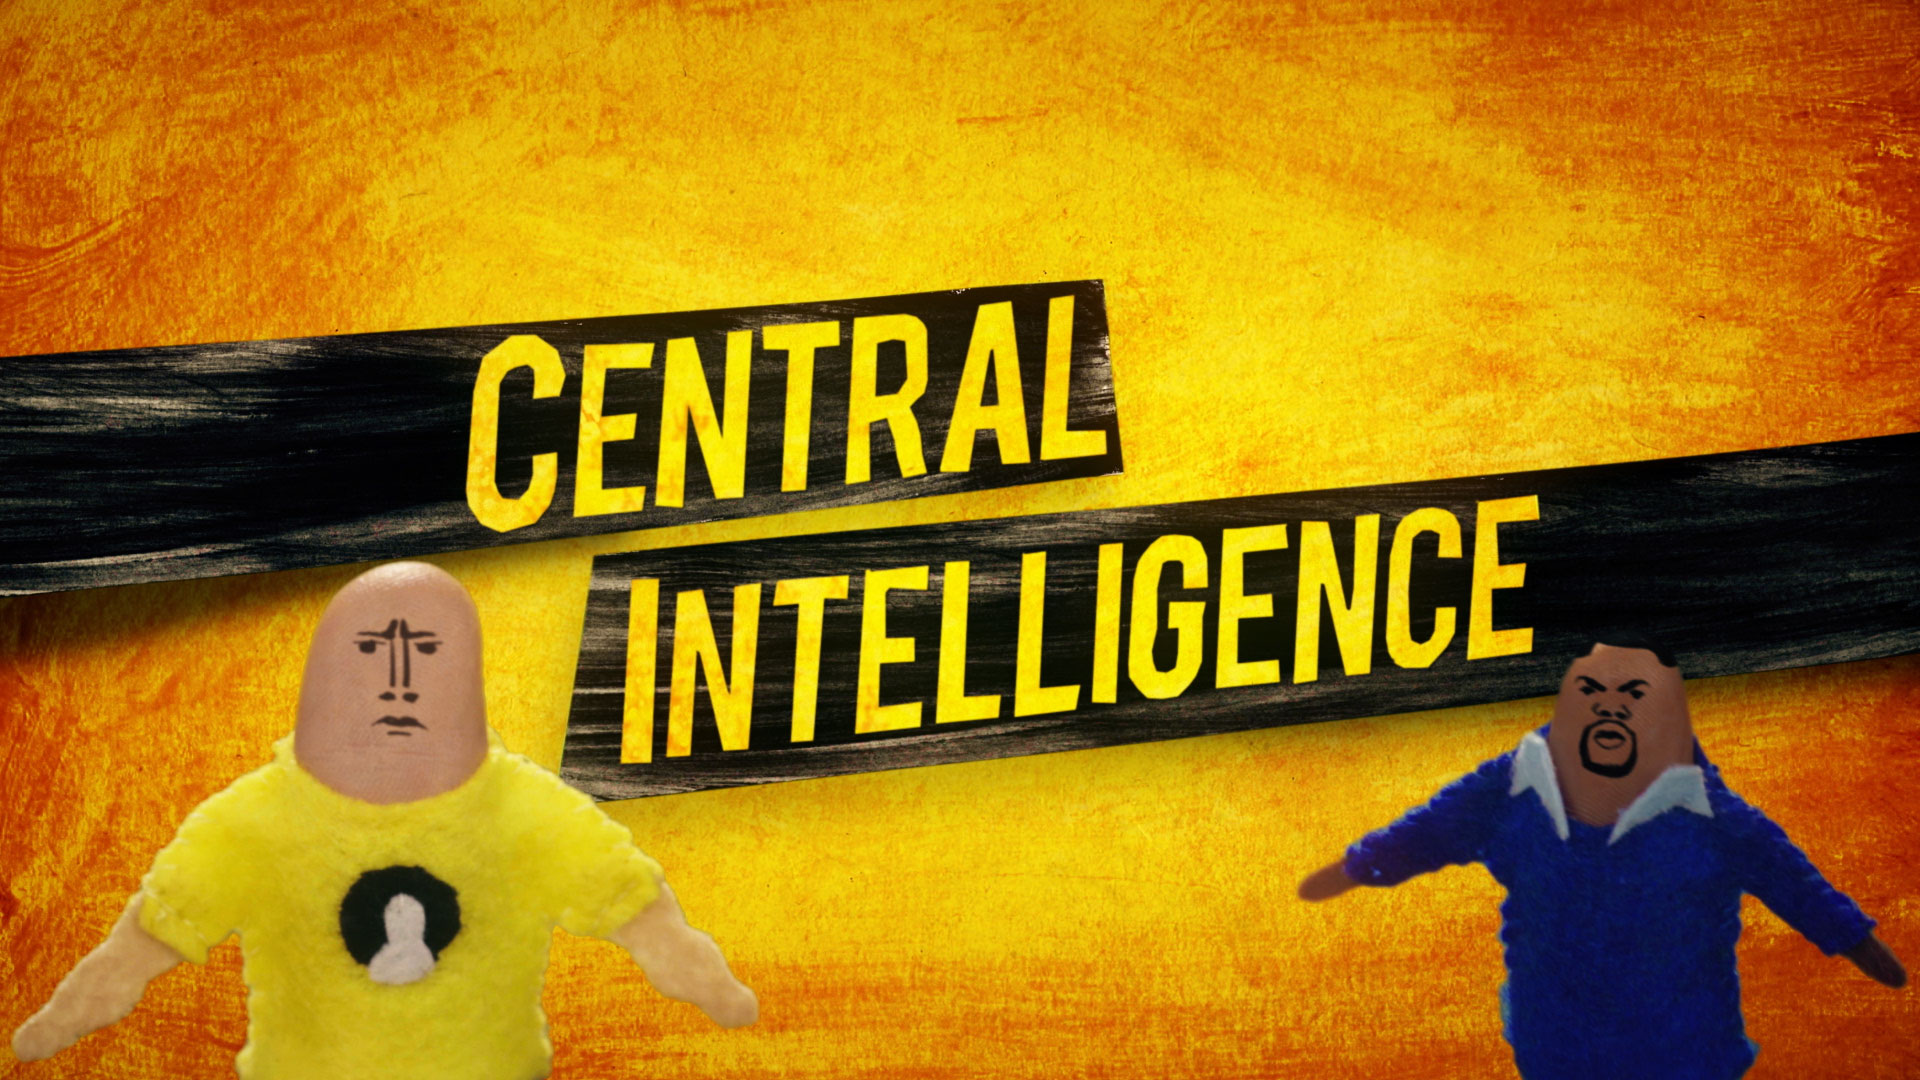 Adult Swim – Central Intelligence